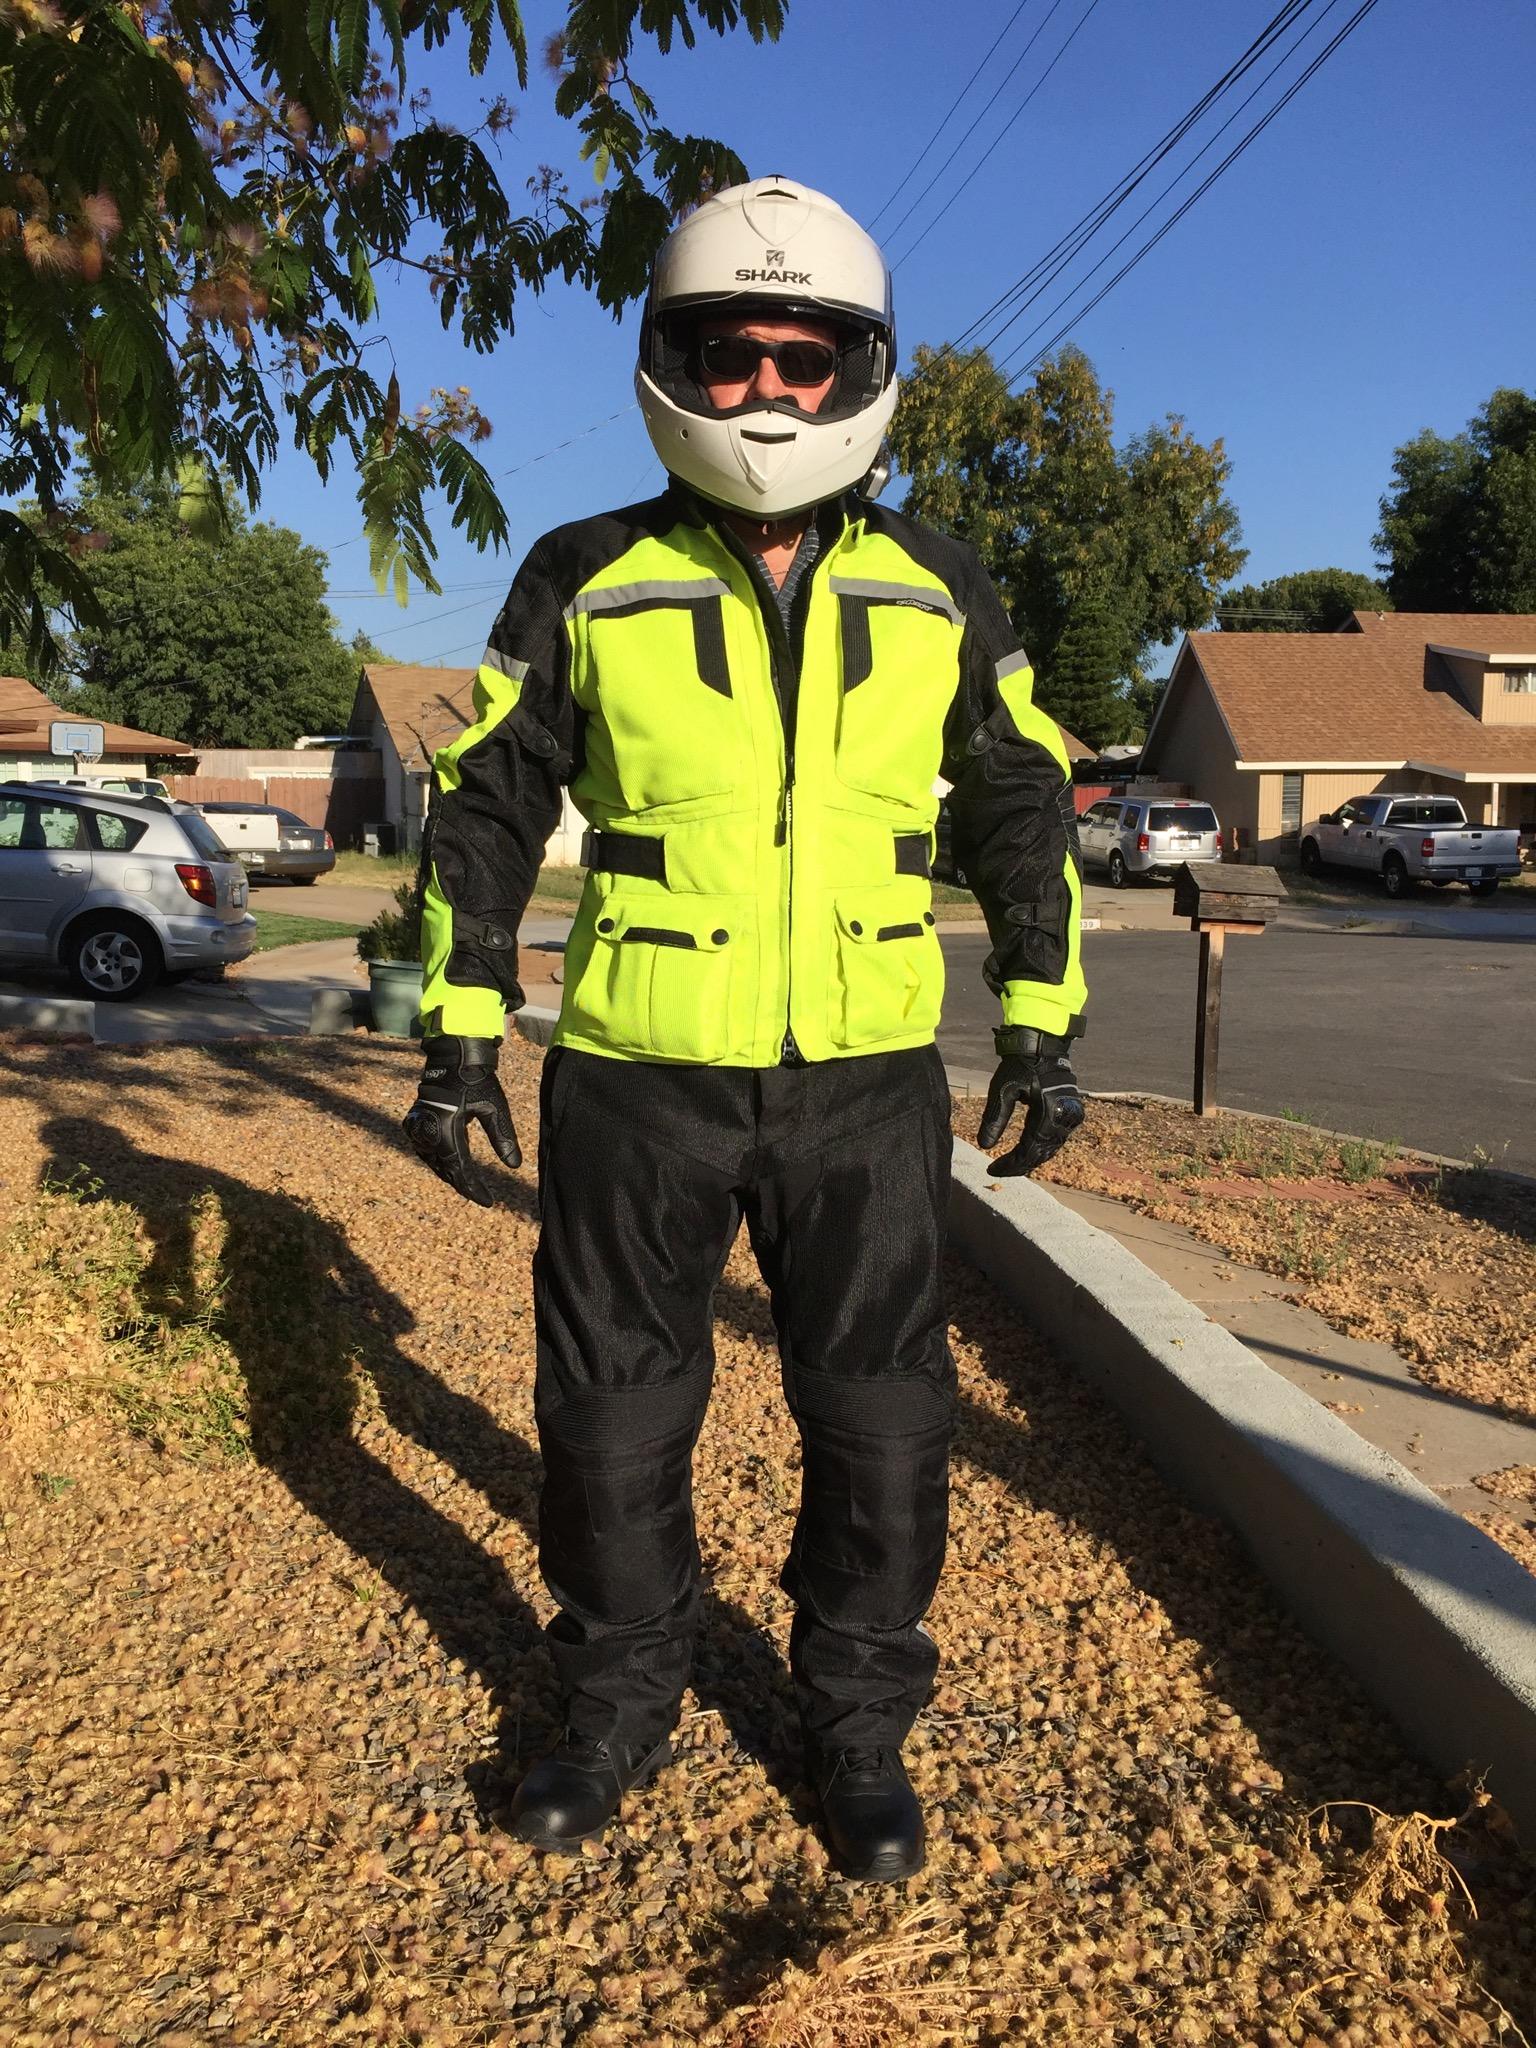 Pilot Motosports Gear - Front View